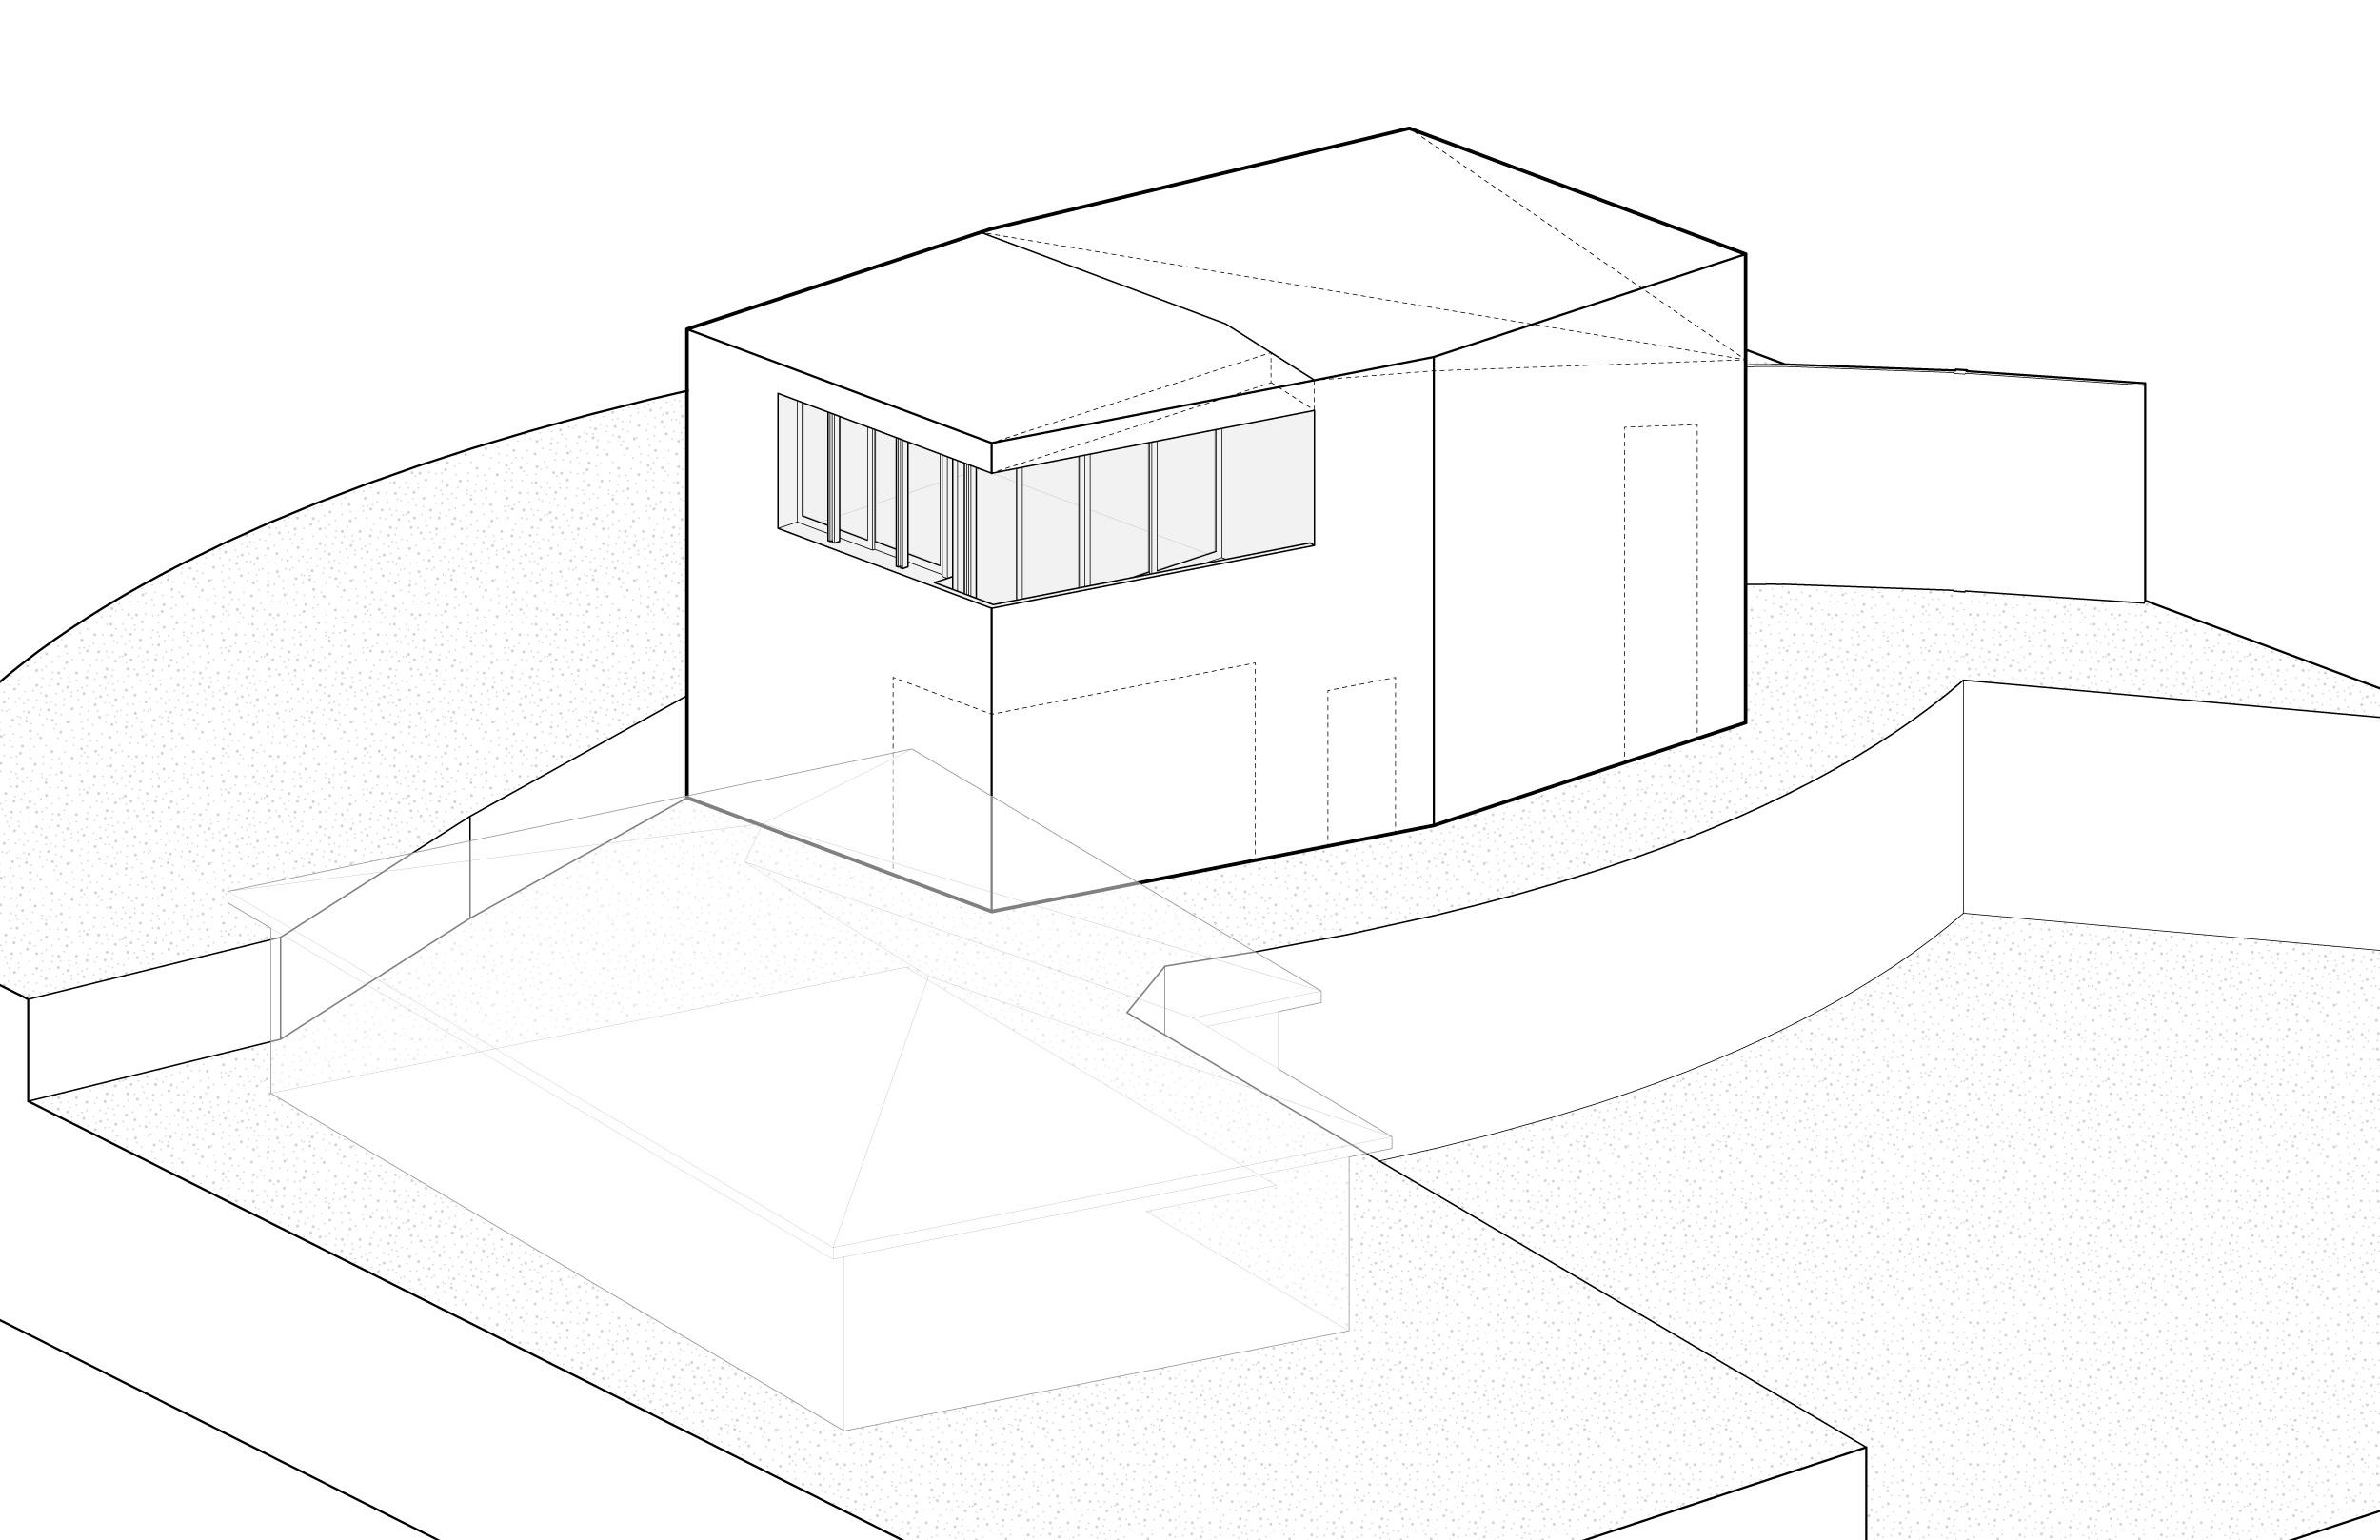 La-Cuesta-House_Diagram_05.jpg